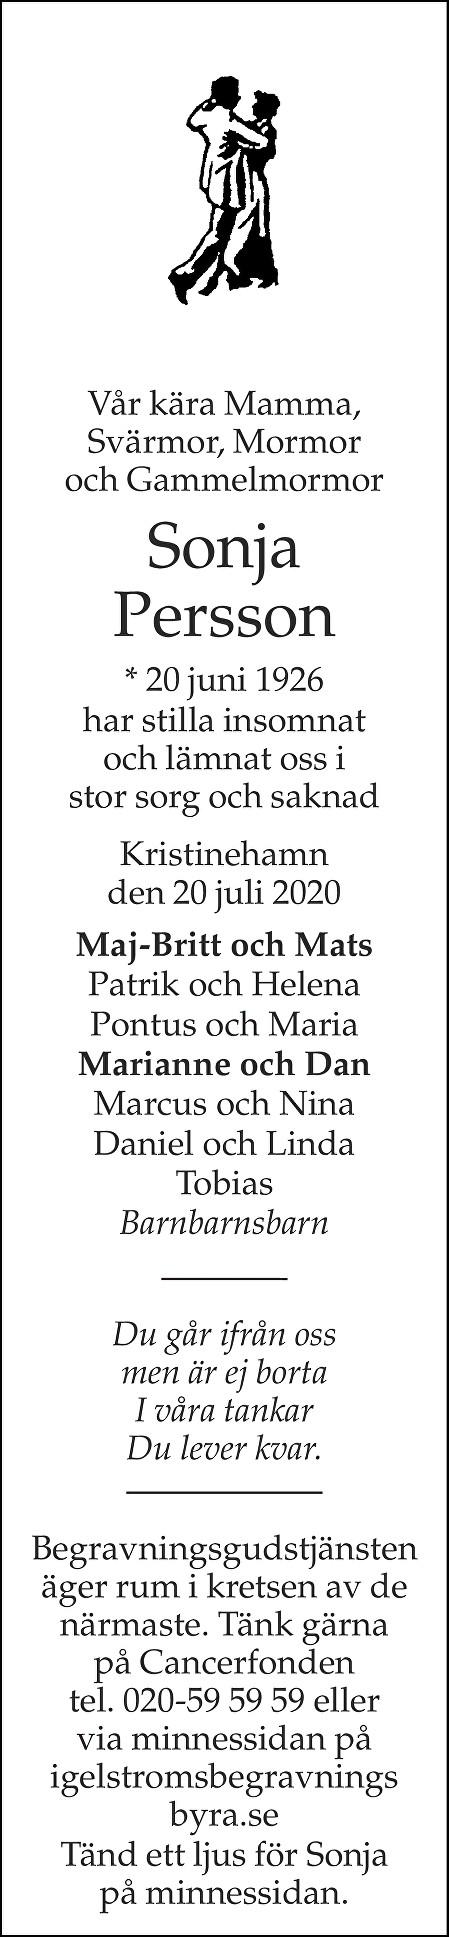 Sonja Persson Death notice